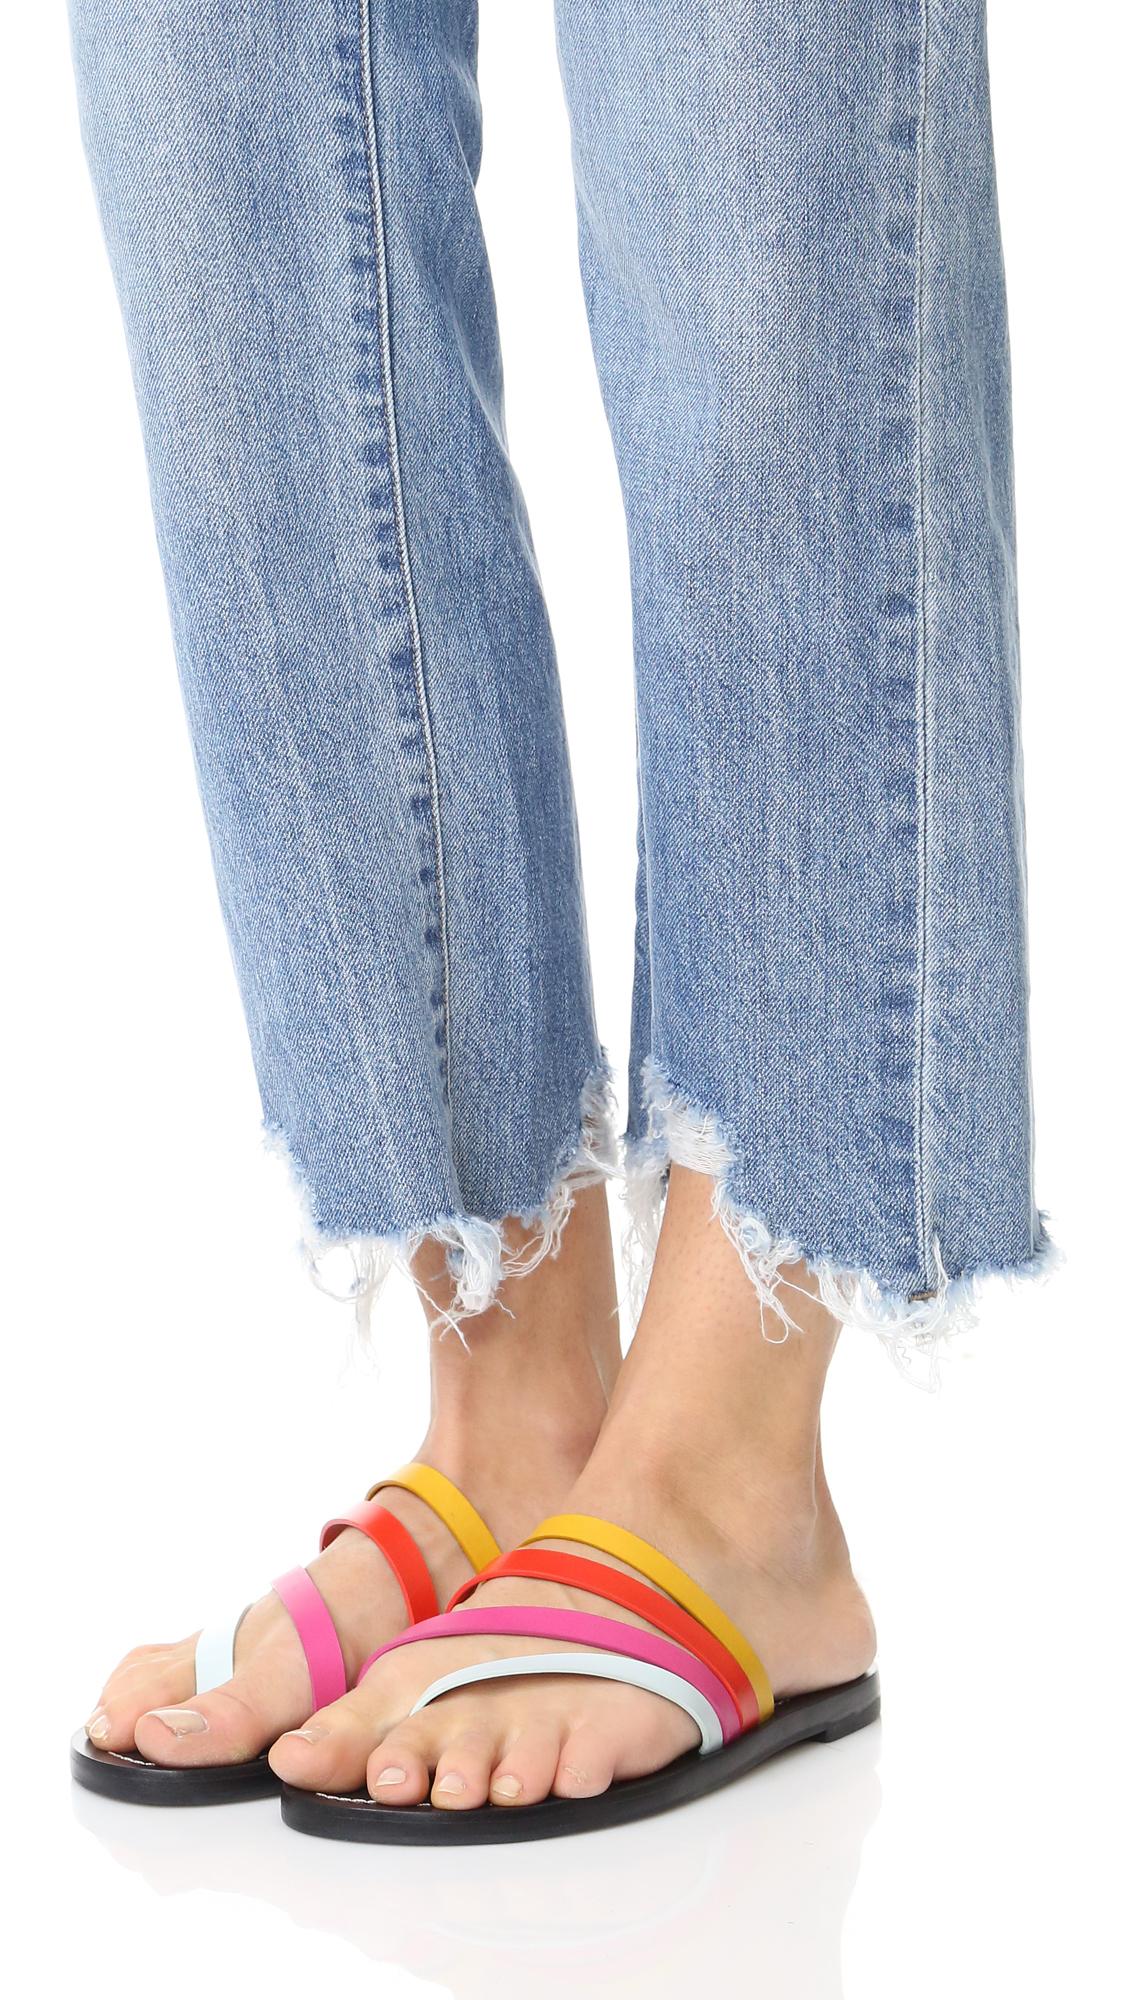 1a0ebeea6d7ac Tory Burch Patos Flat Sandals